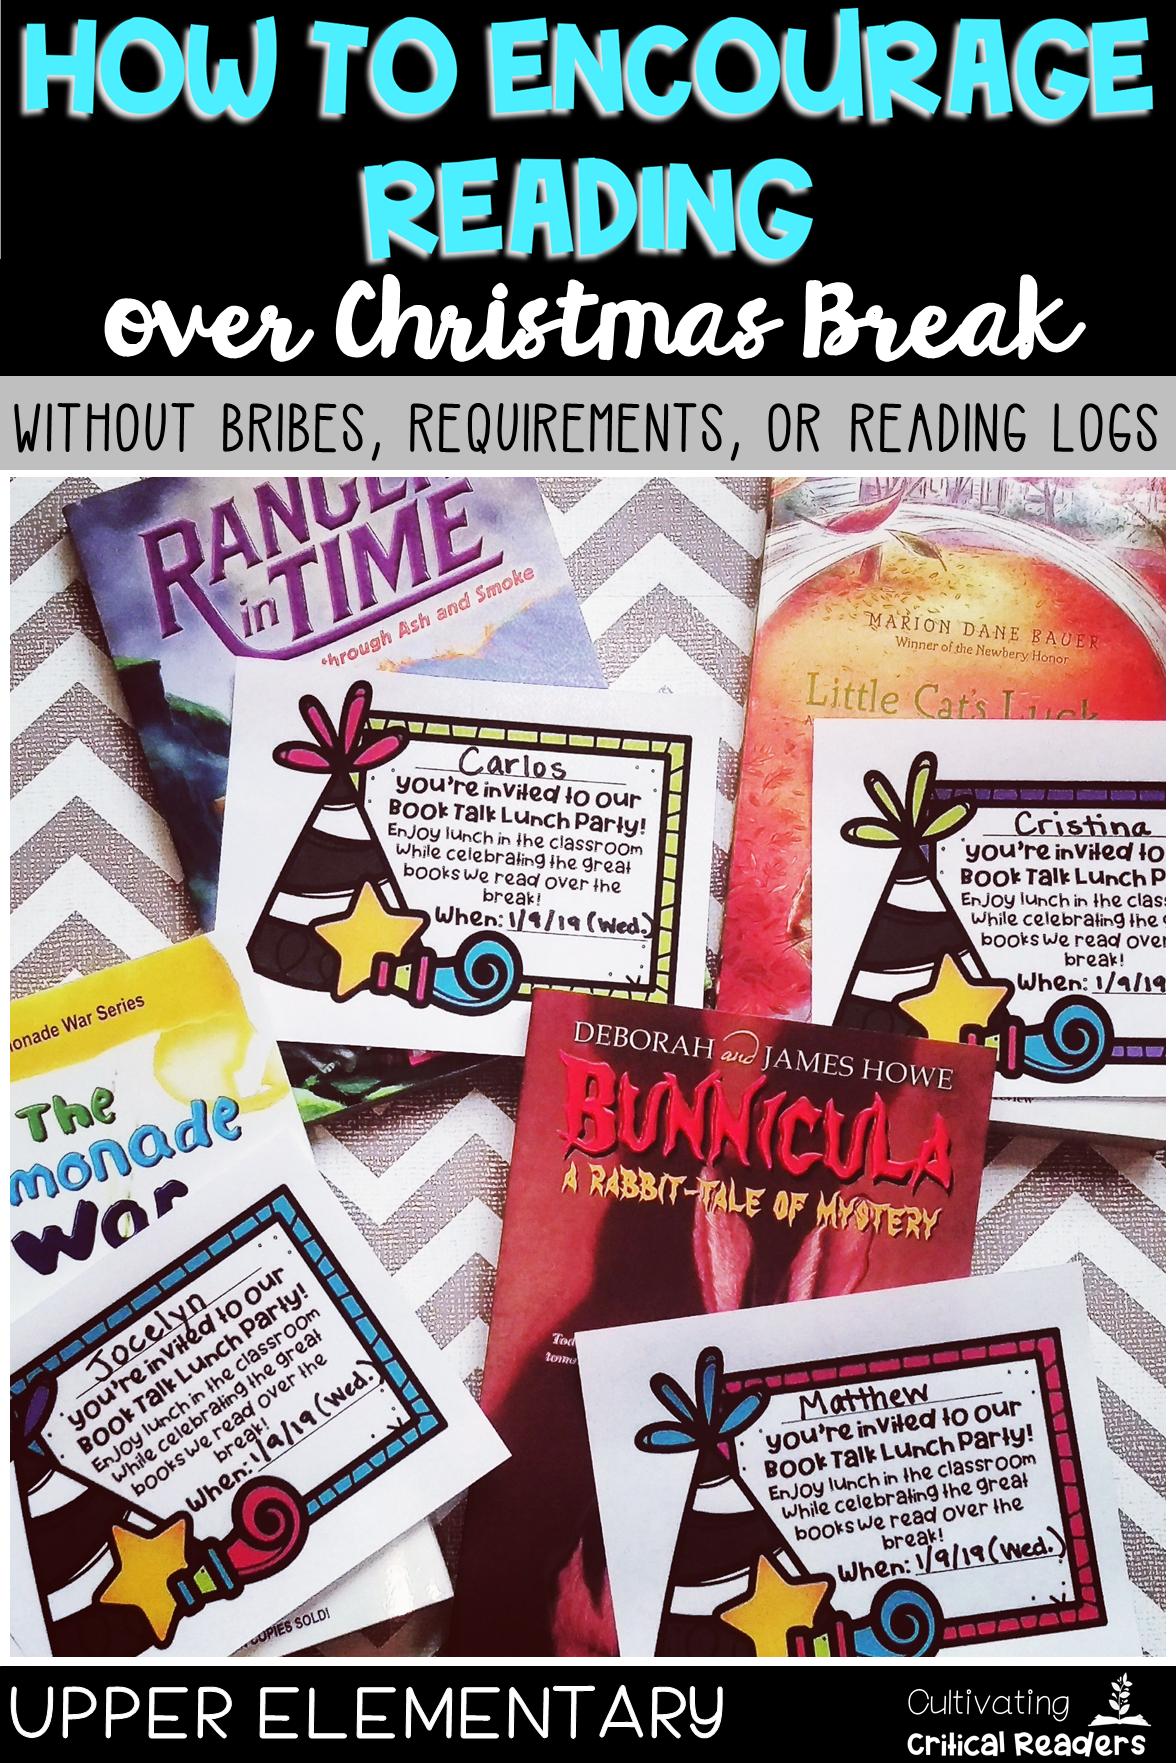 How to Ecourage Reading over Christmas Break